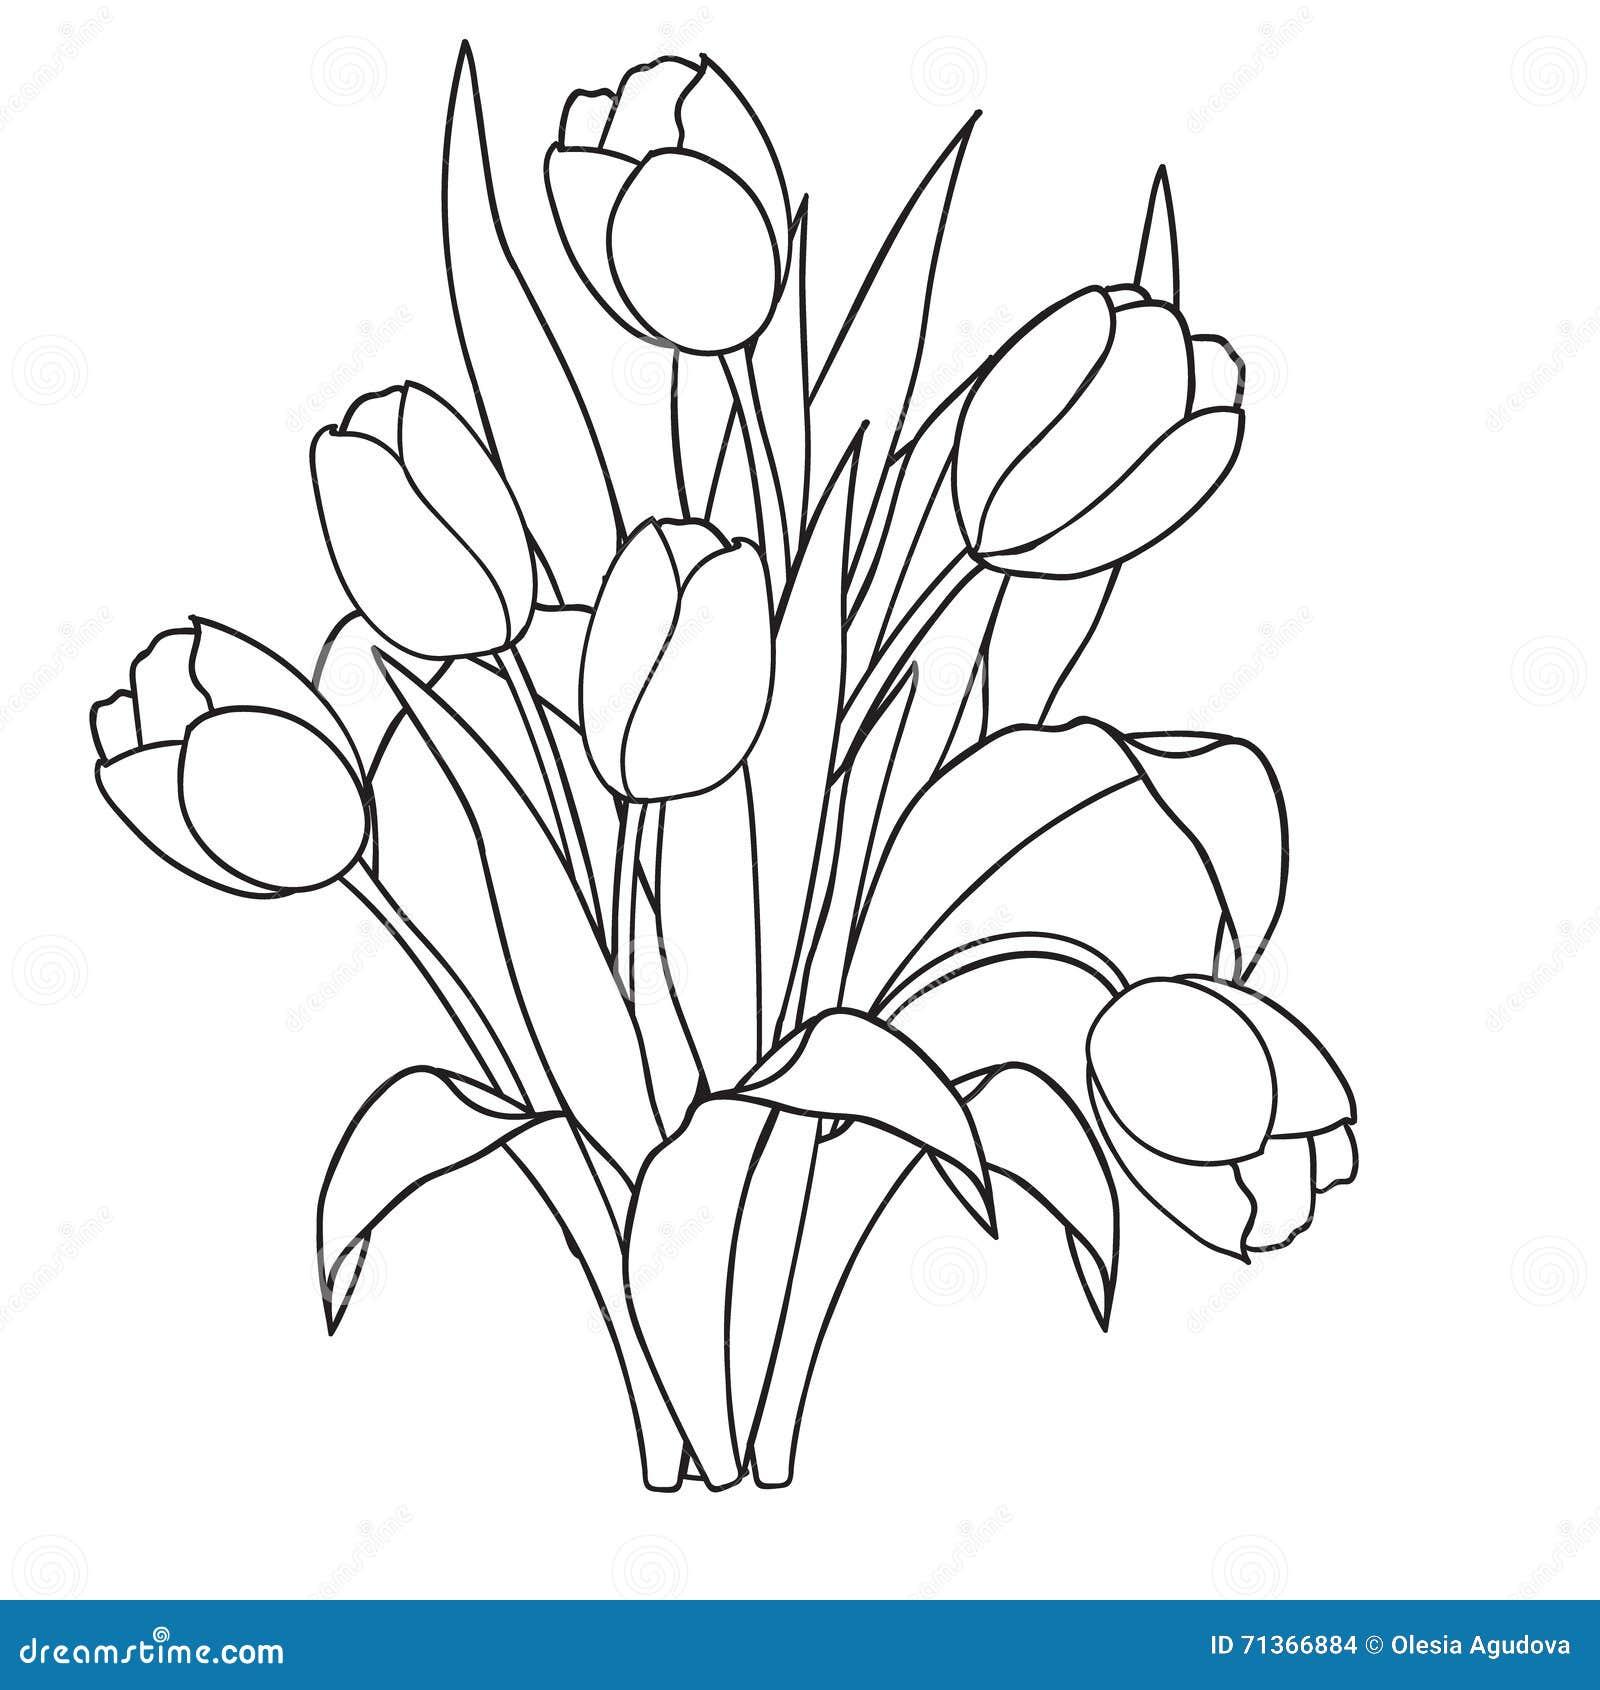 Tulips Flowers Ornamental Black